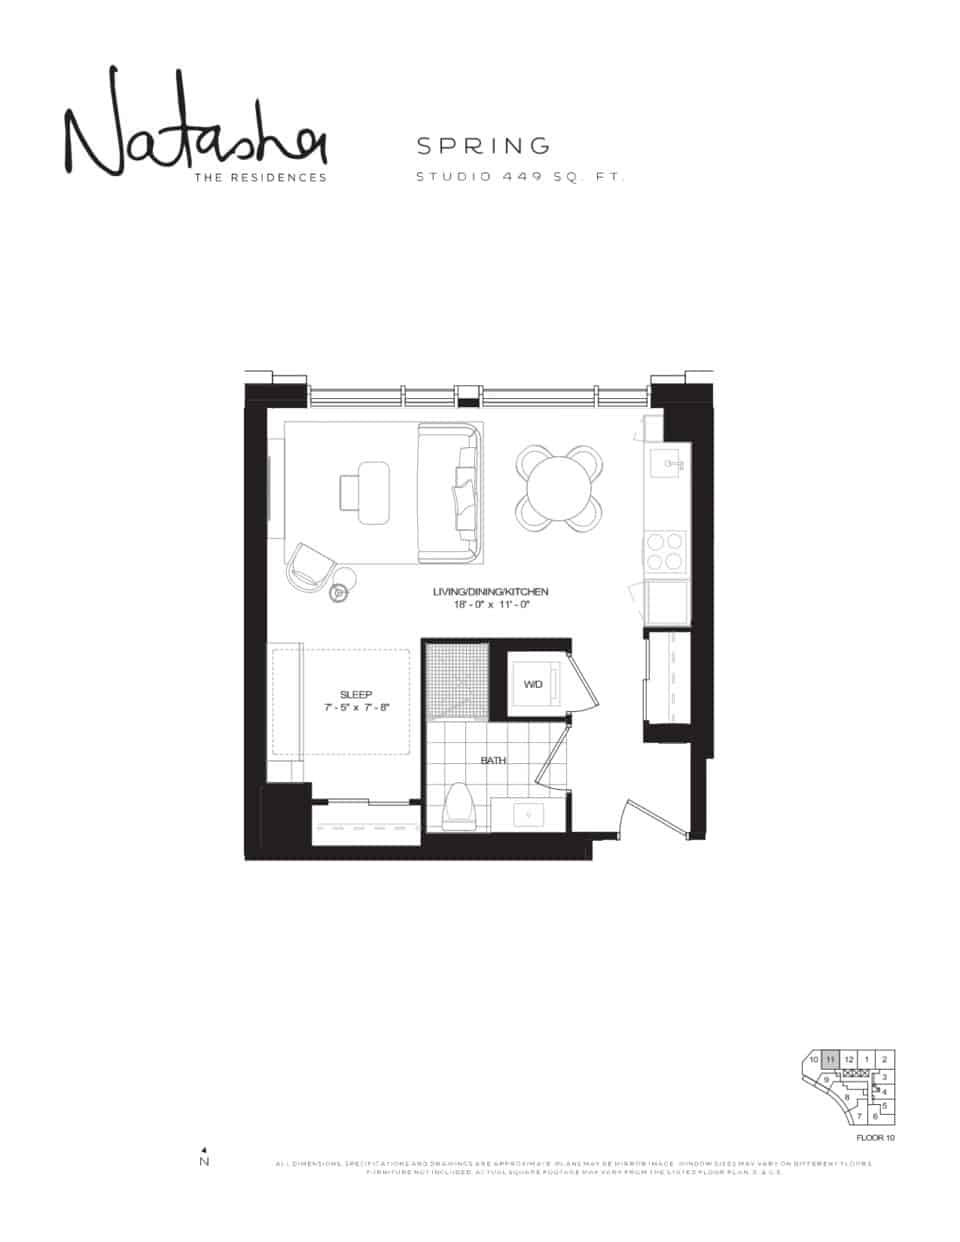 2021 09 02 11 03 20 natashatheresidences lanterradevelopments floorplans spring